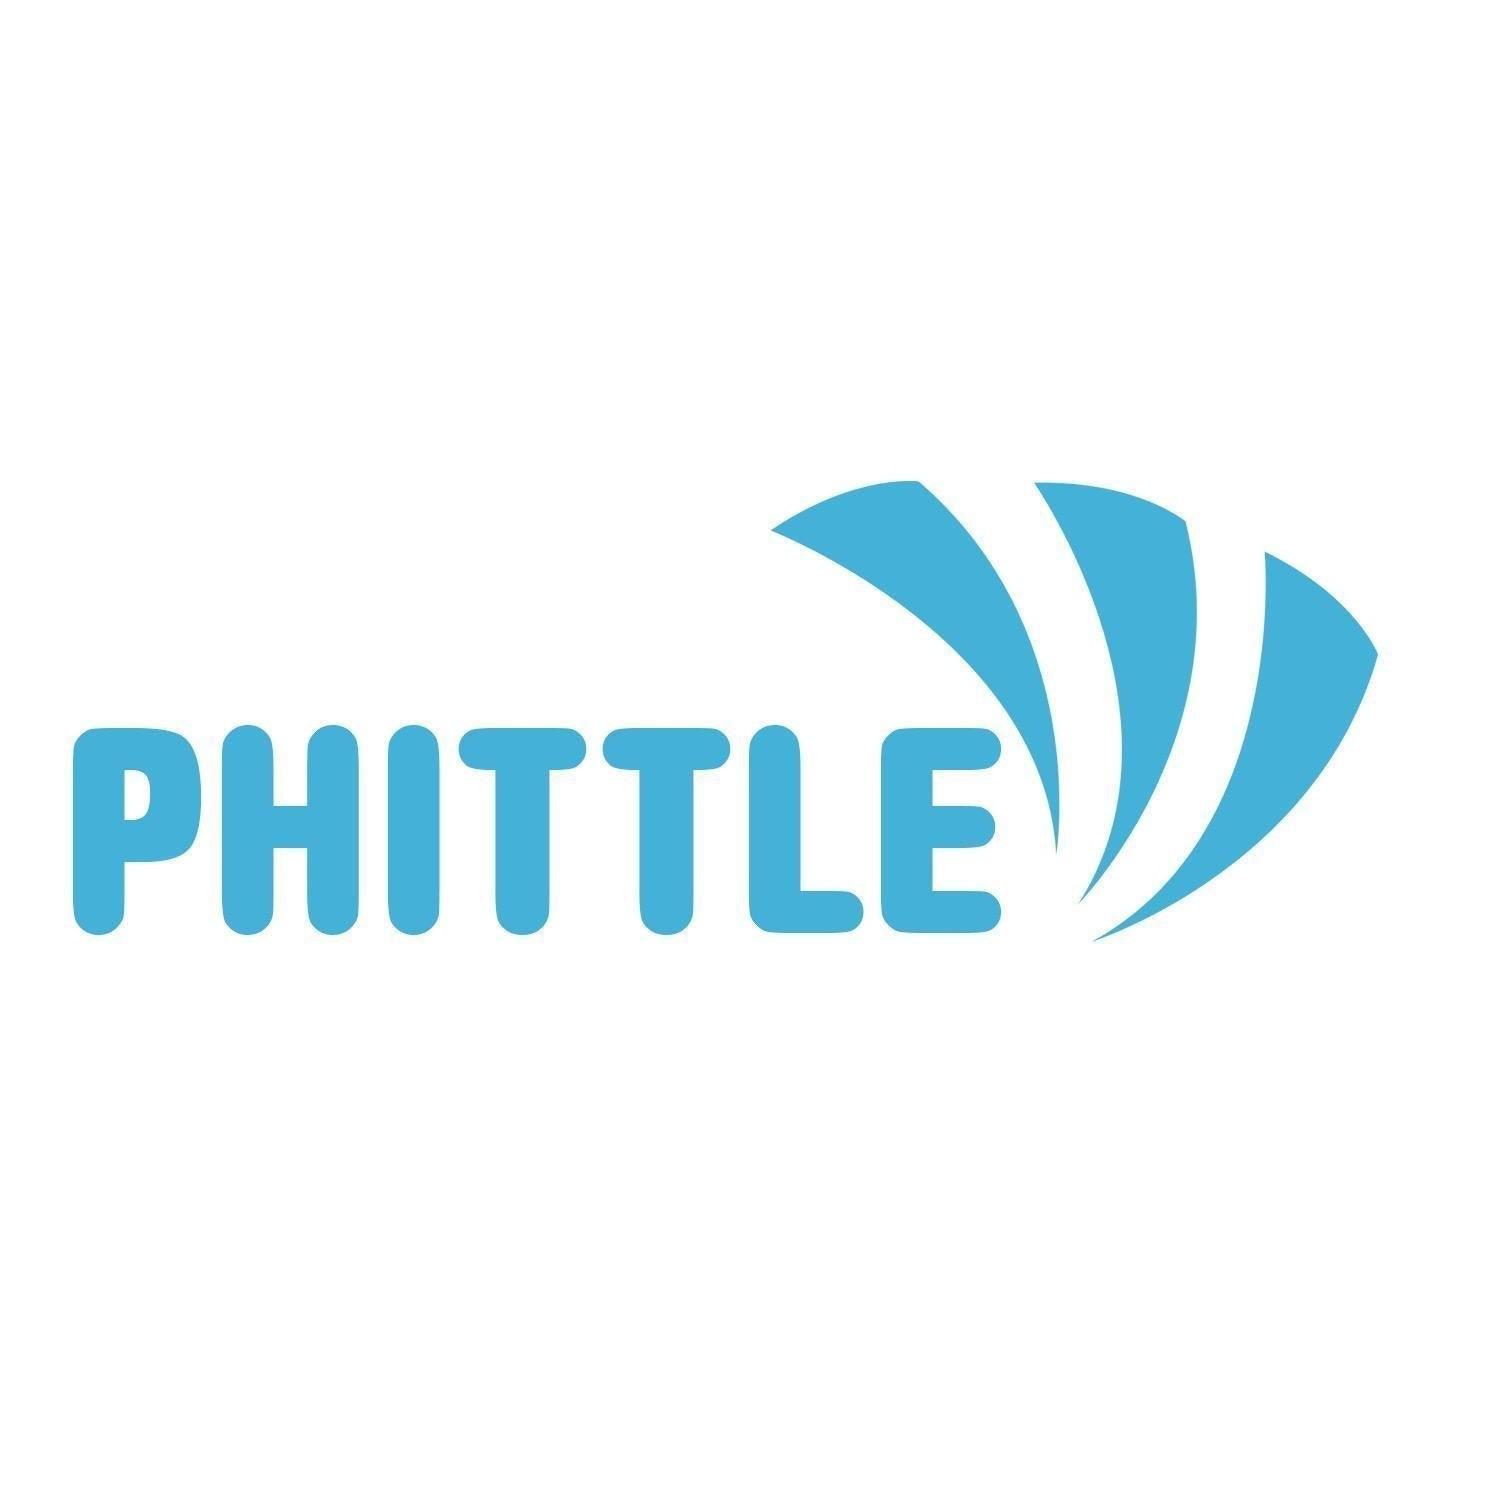 Phittle